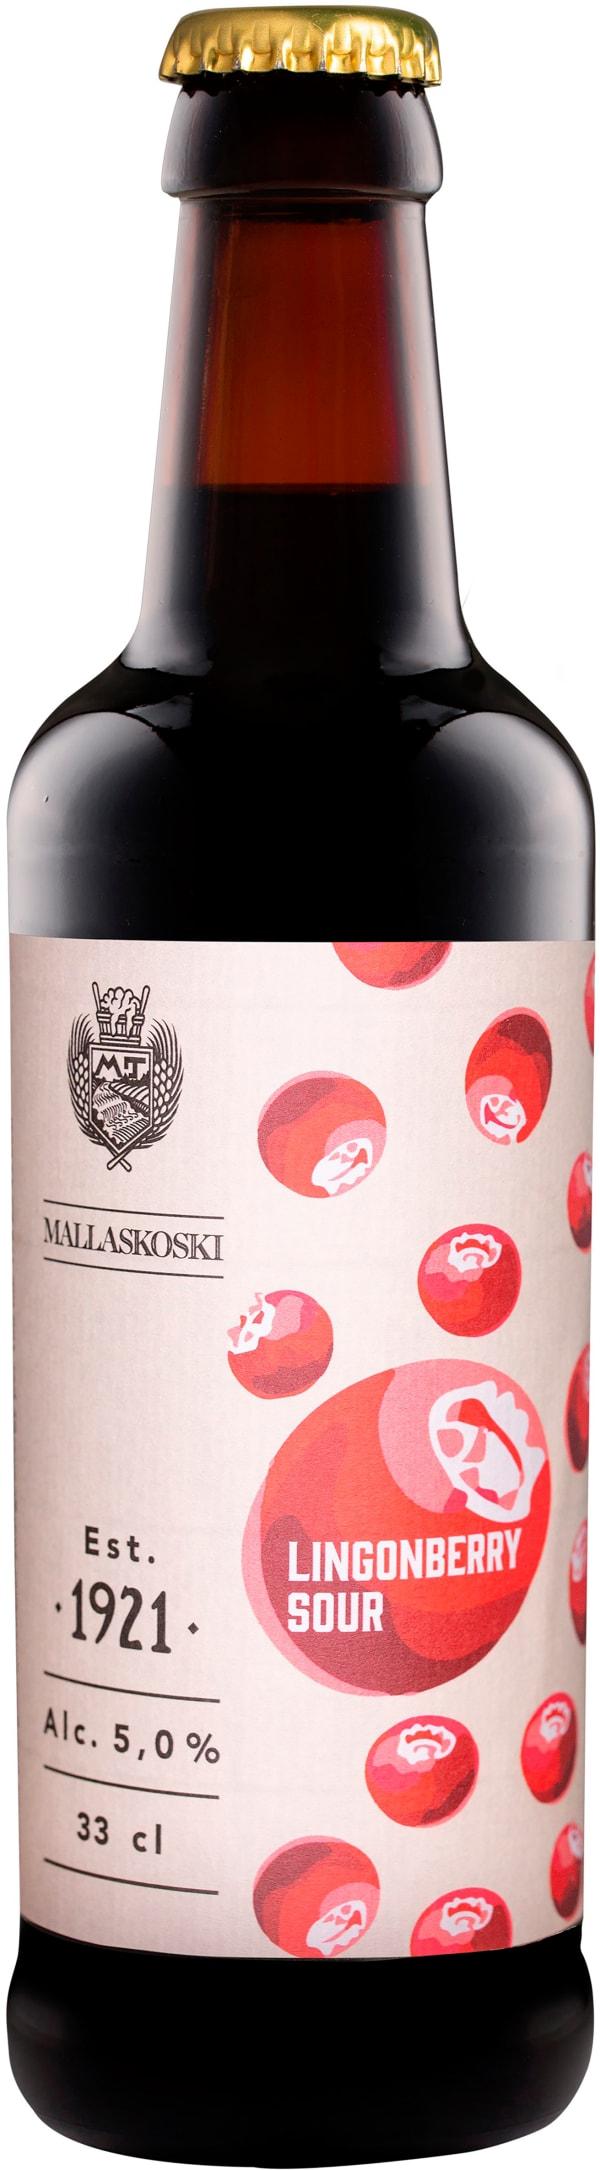 Mallaskoski Lingonberry Sour